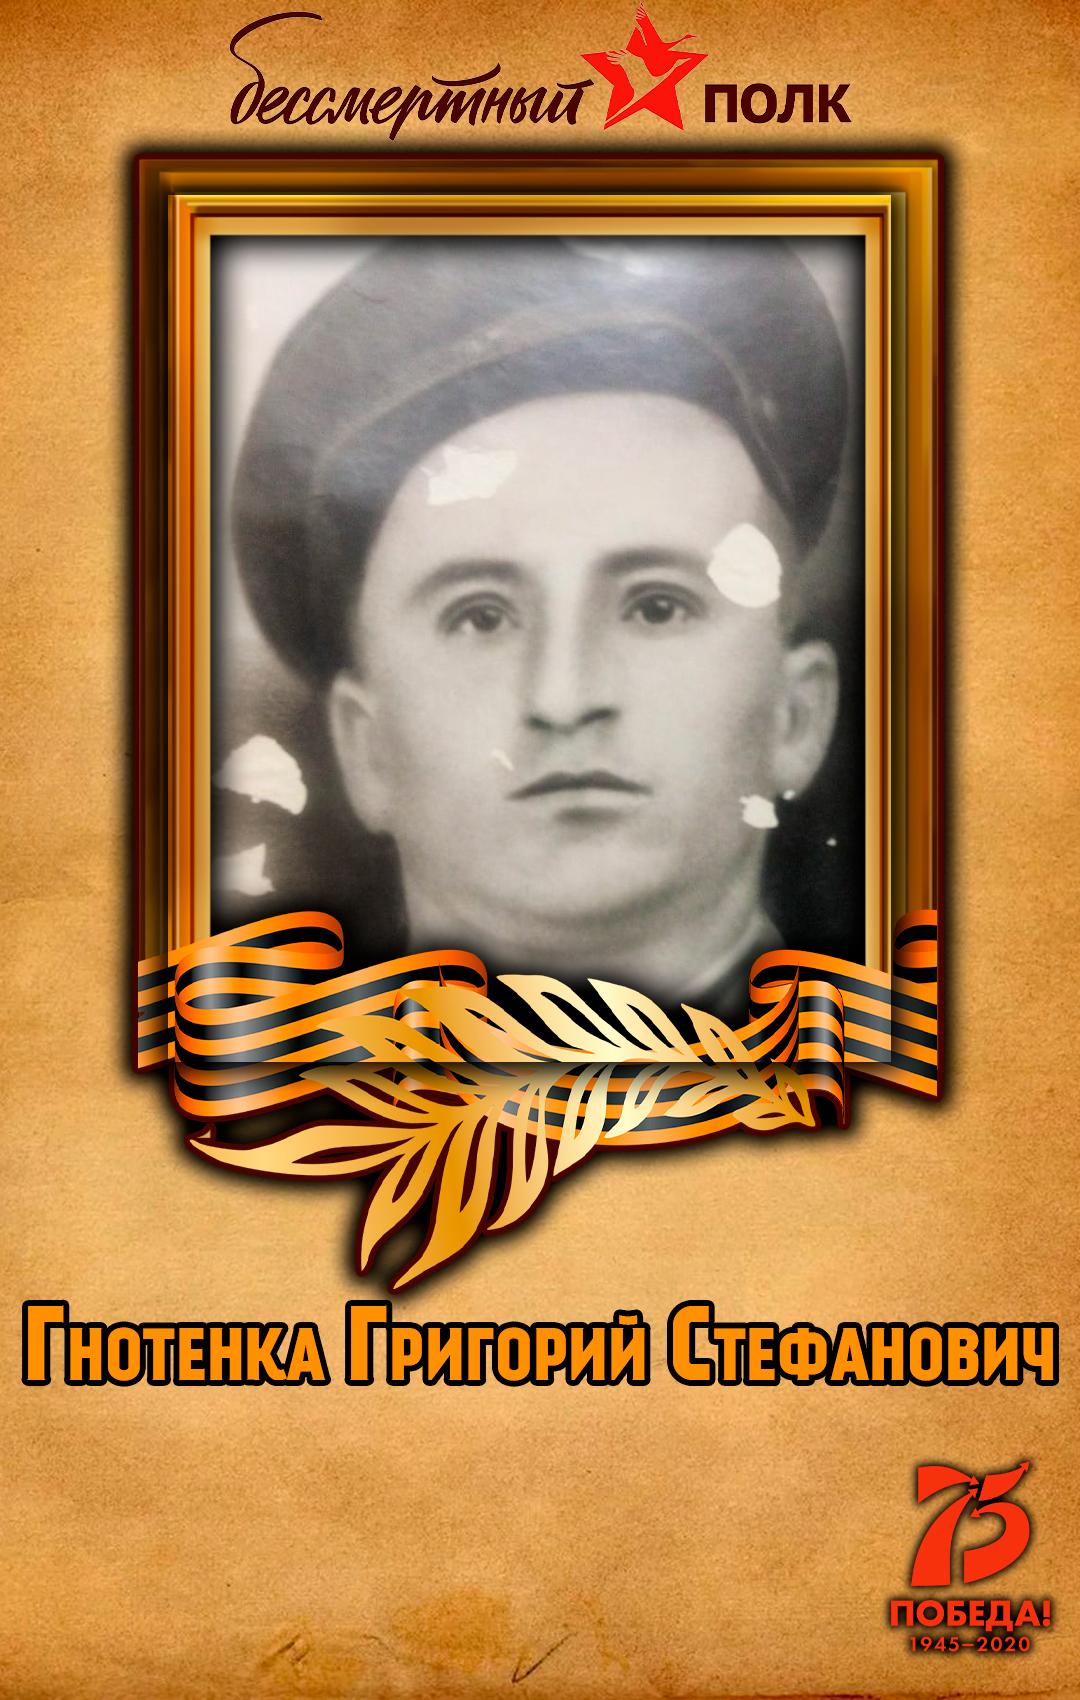 Гнотенка-Григорий-Стефанович